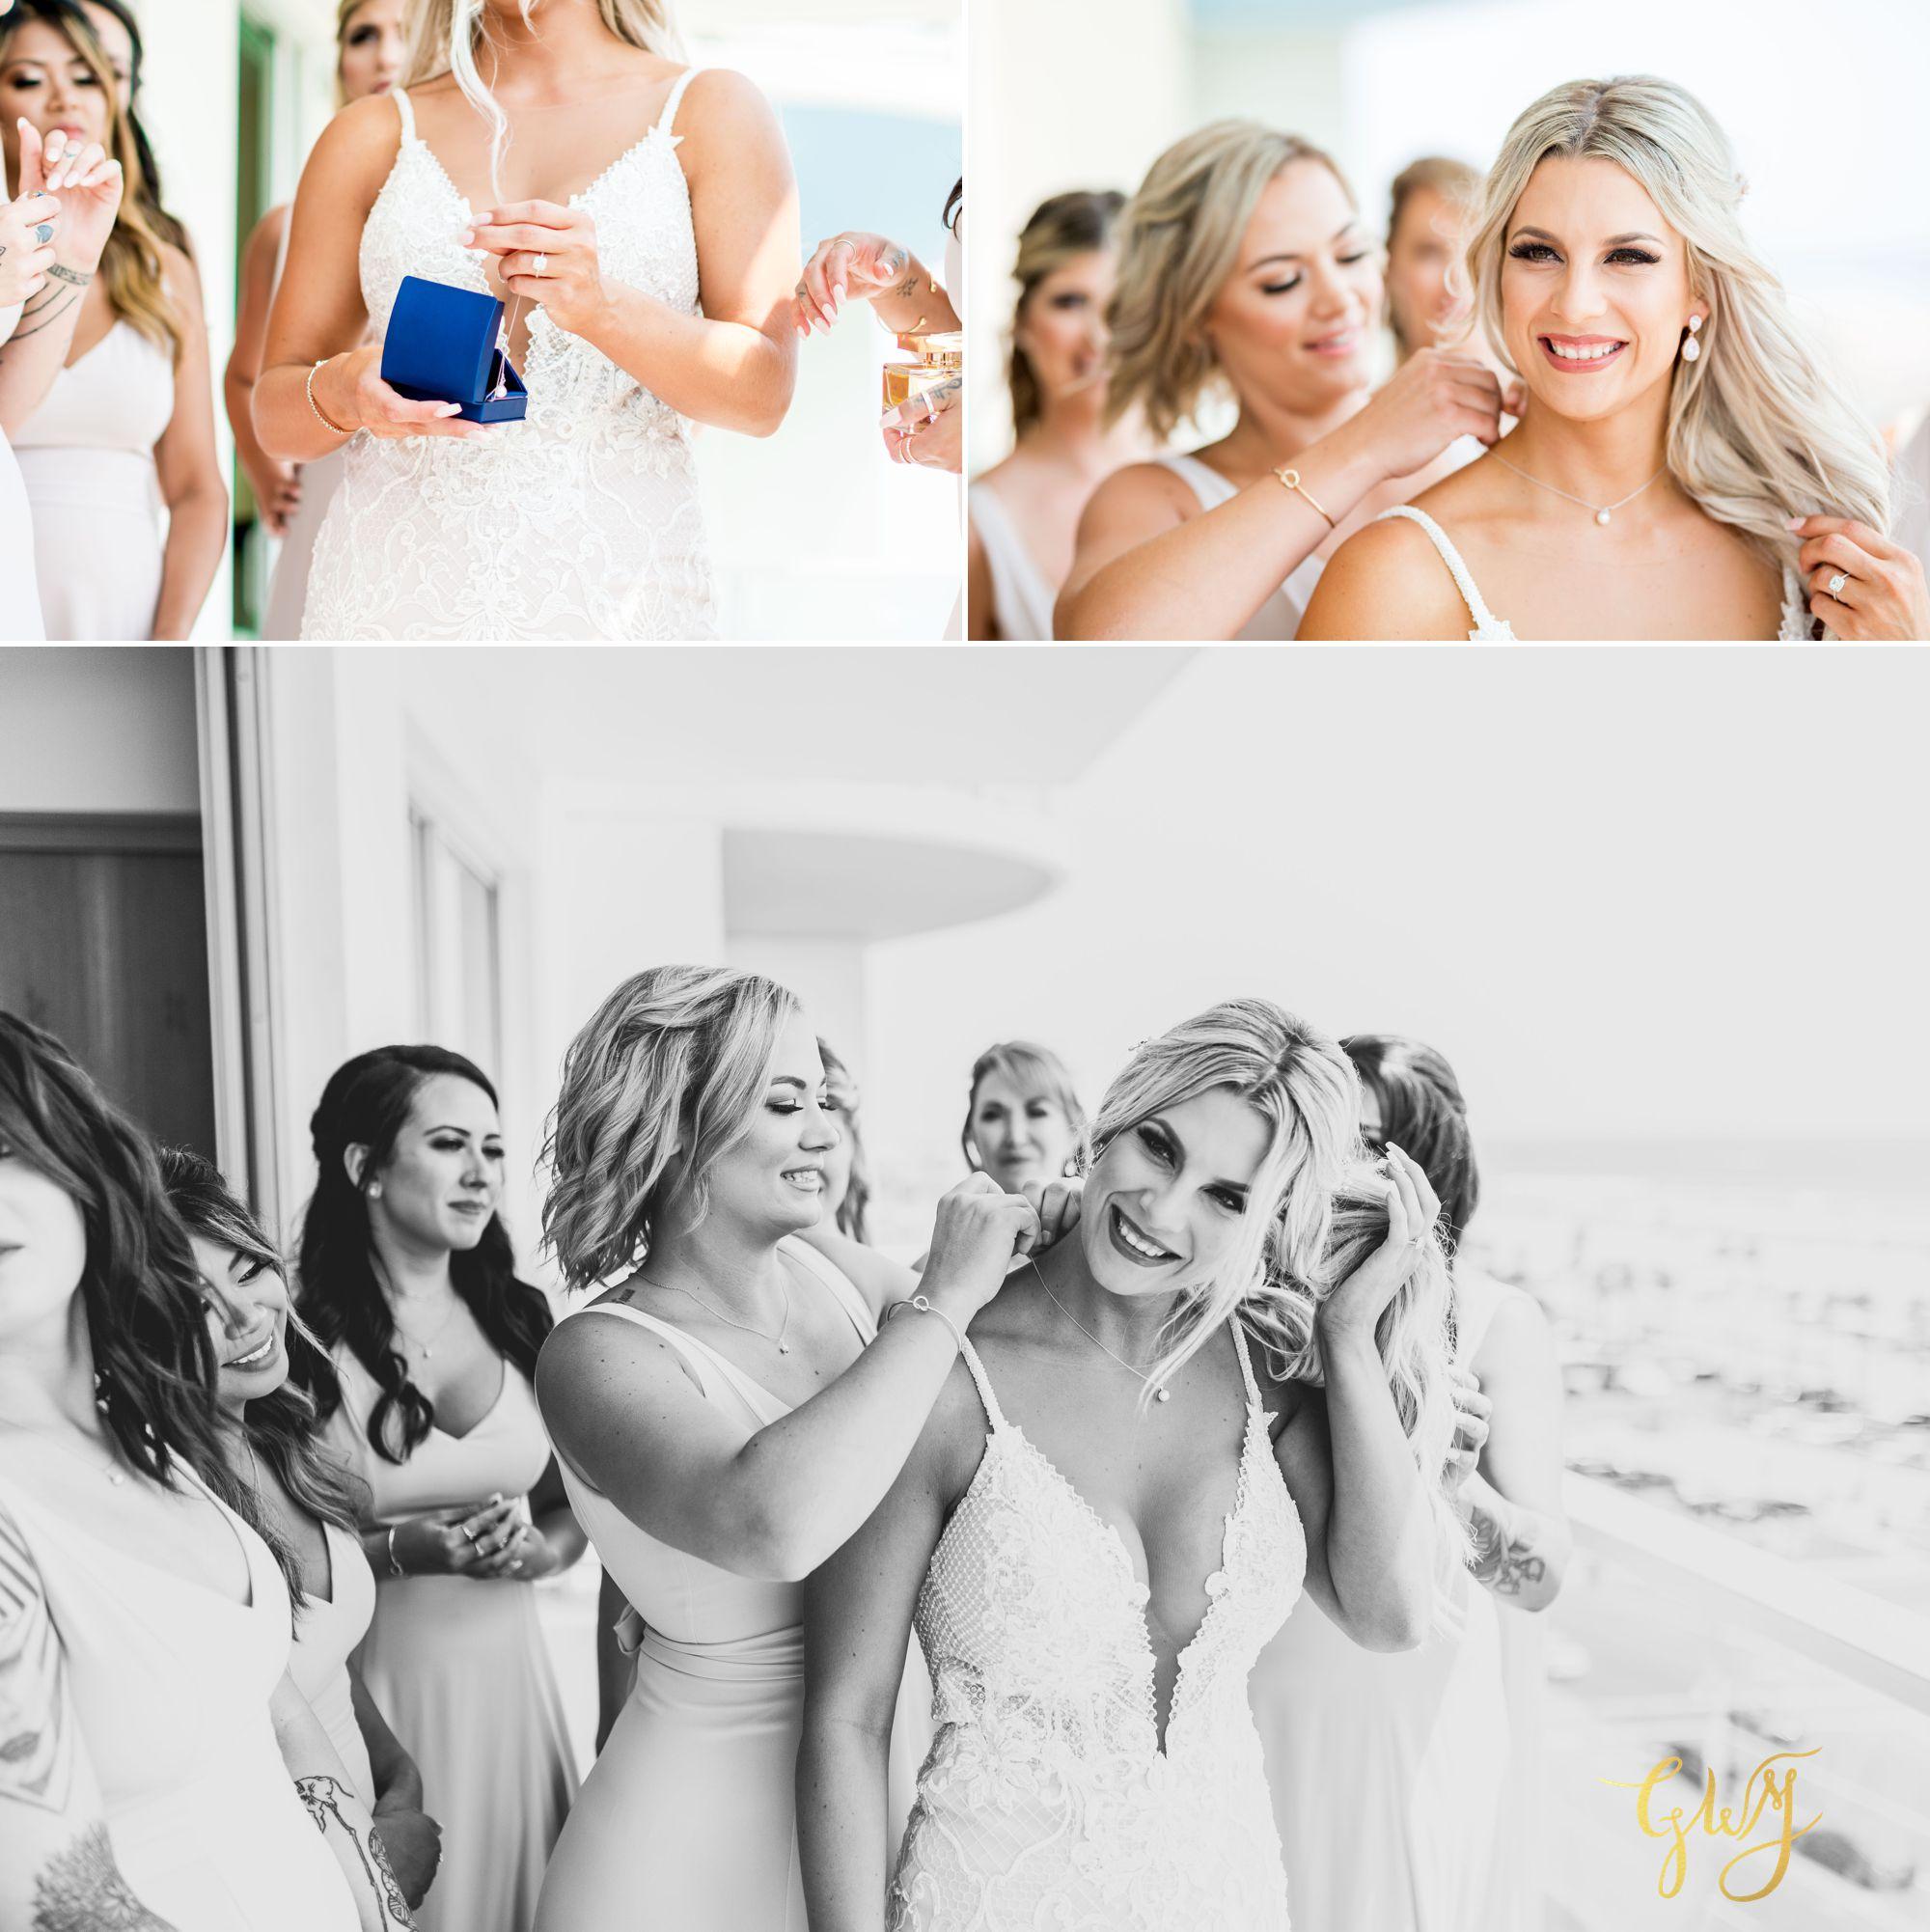 Christien + Crystal Pasea Hotel & Spa Huntington Beach Wedding by Glass Woods Media 15.jpg